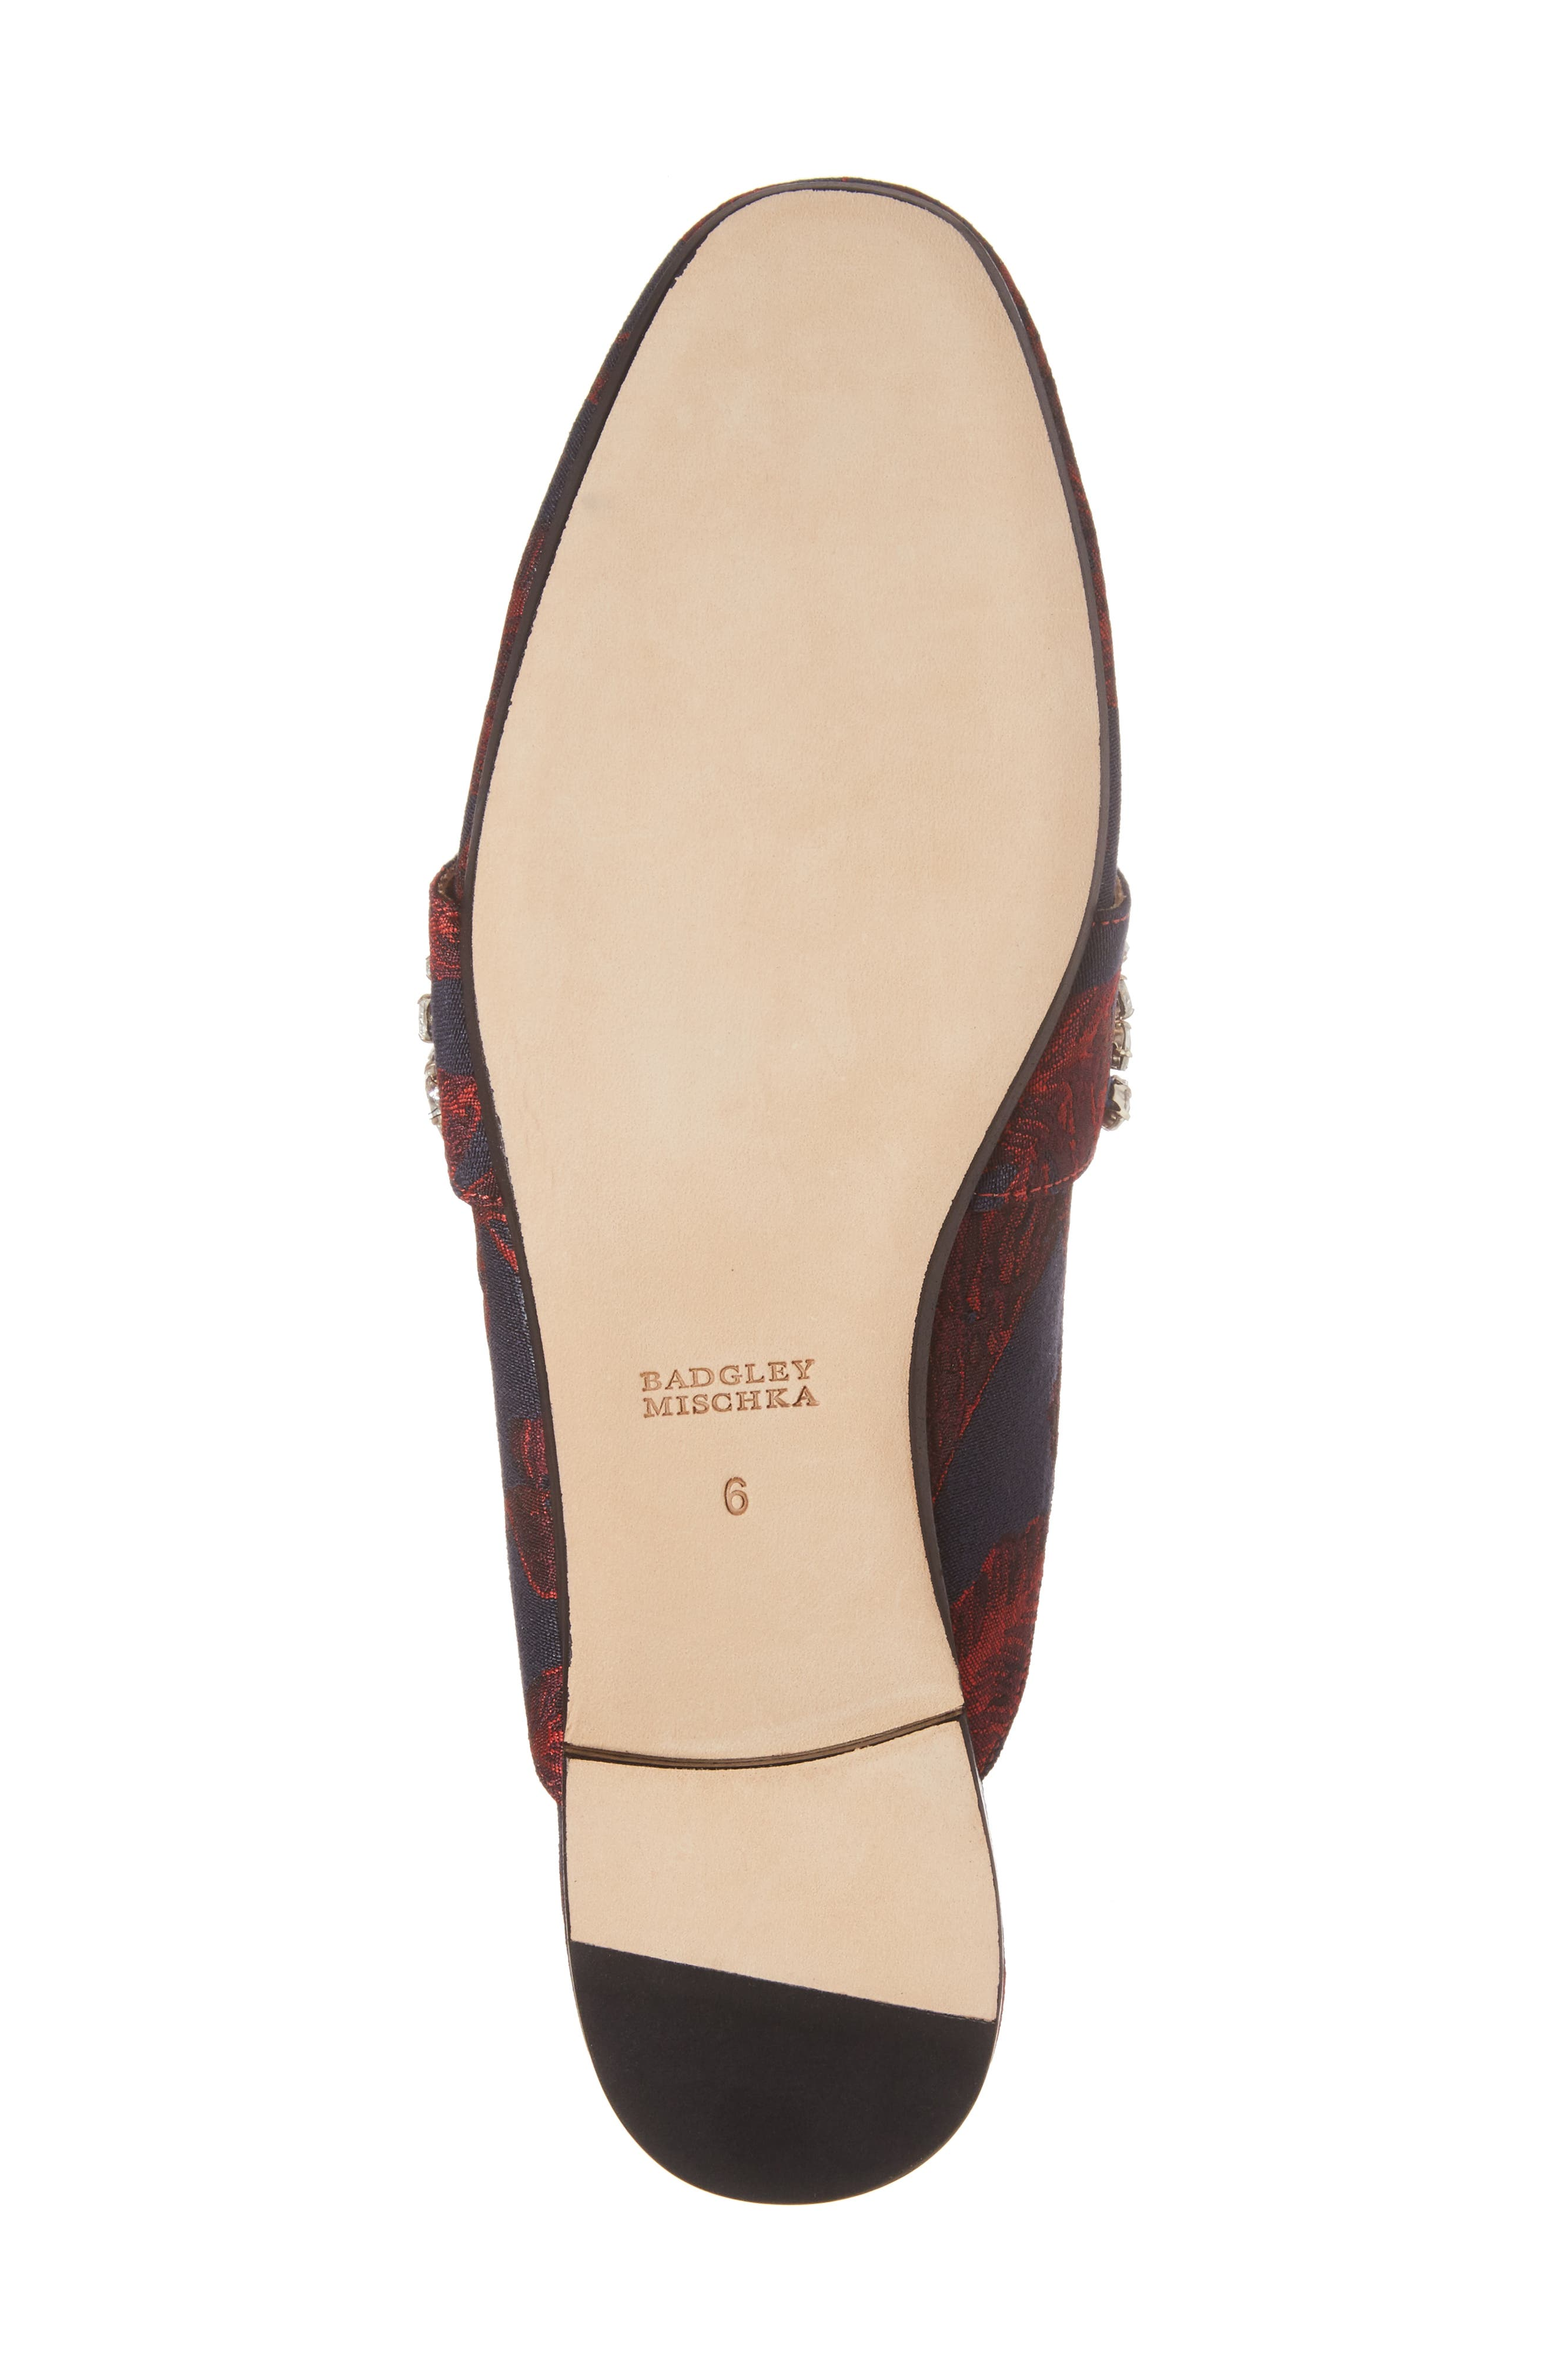 Kana Embellished Loafer Mule,                             Alternate thumbnail 6, color,                             Burgundy Fabric